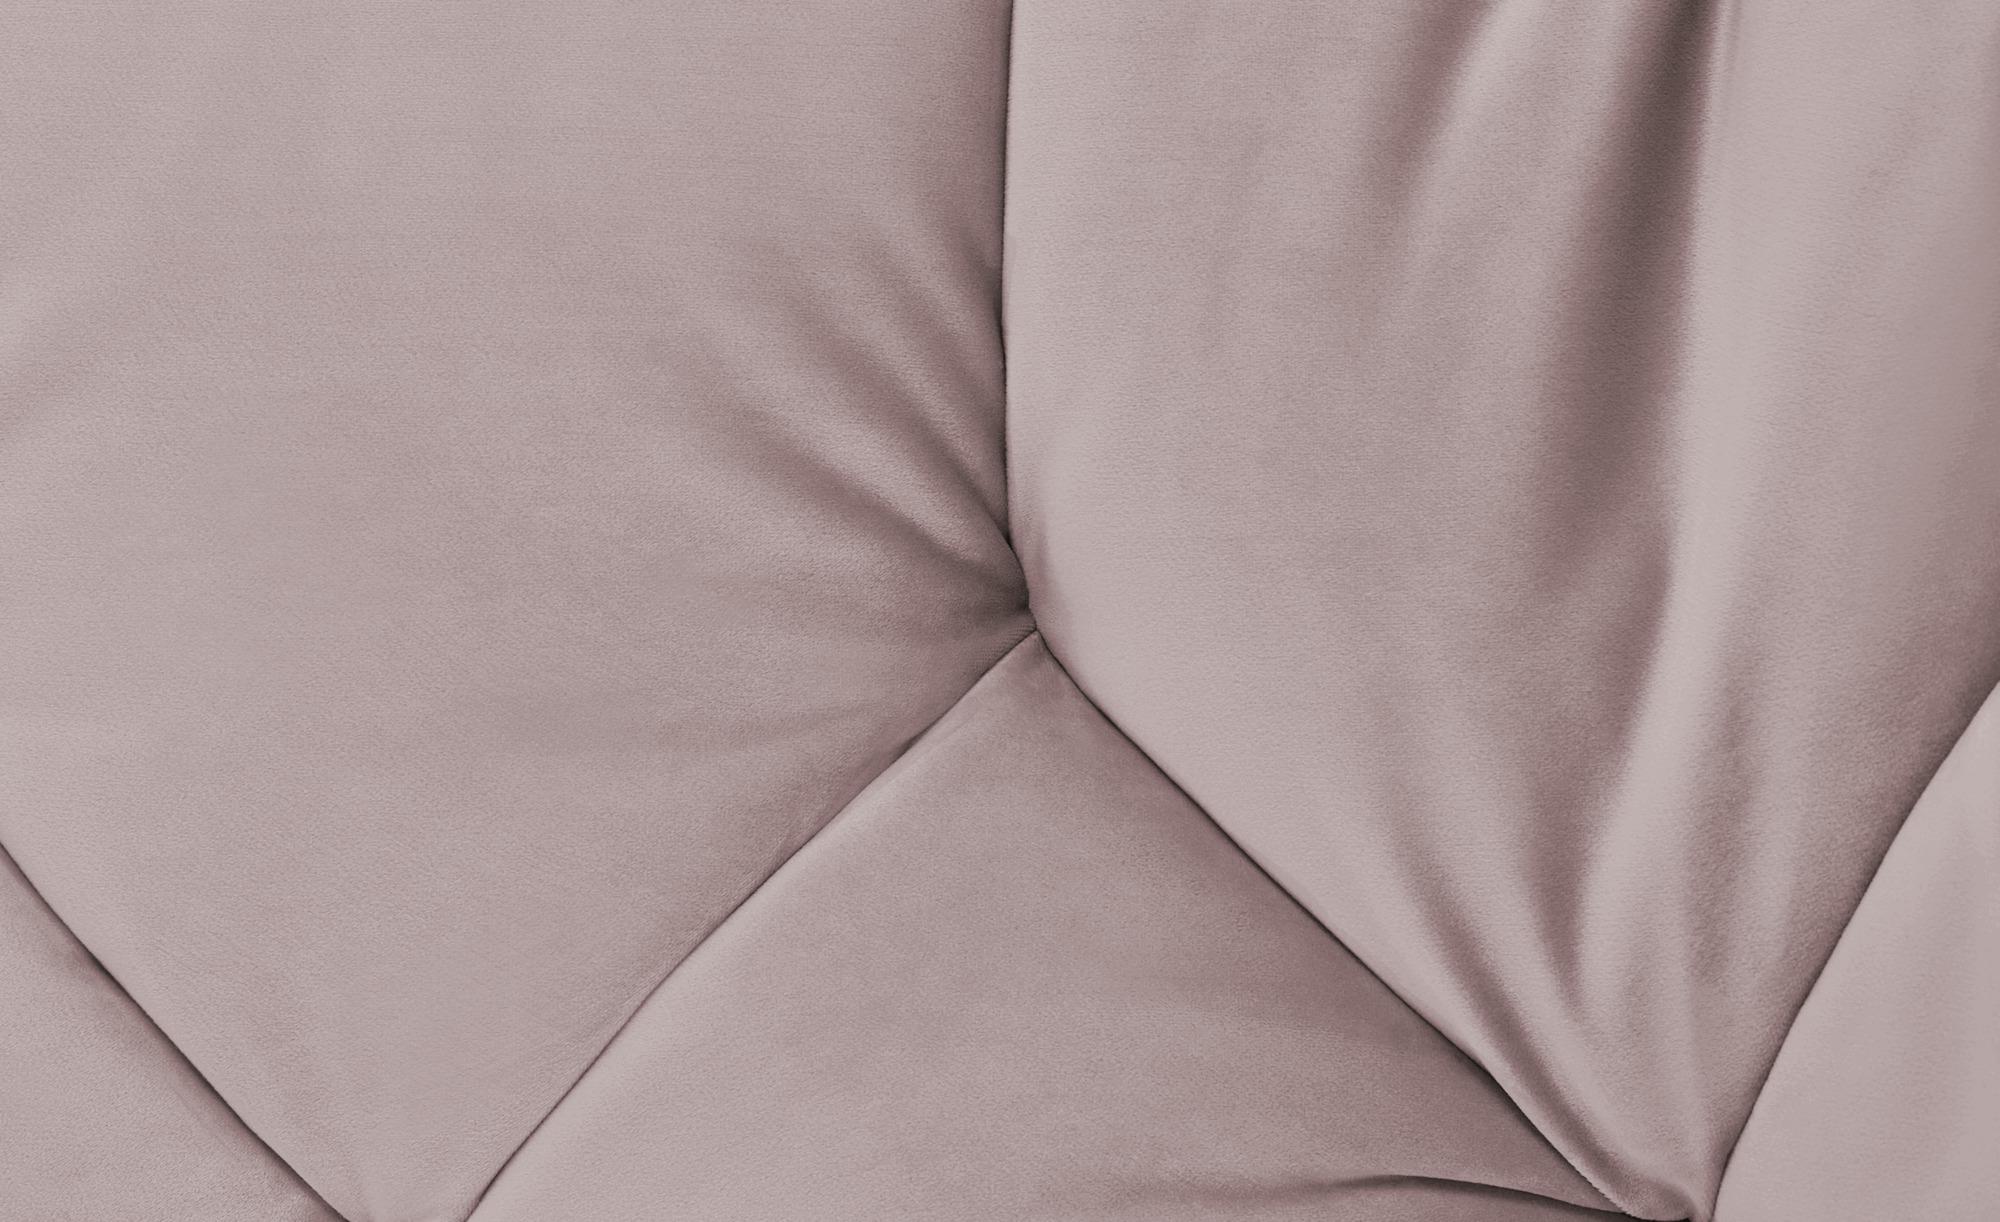 Hochlehnsessel  Caldara ¦ rosa/pink ¦ Maße (cm): B: 100 H: 106 T: 95 Polstermöbel > Sessel > Polstersessel - Höffner